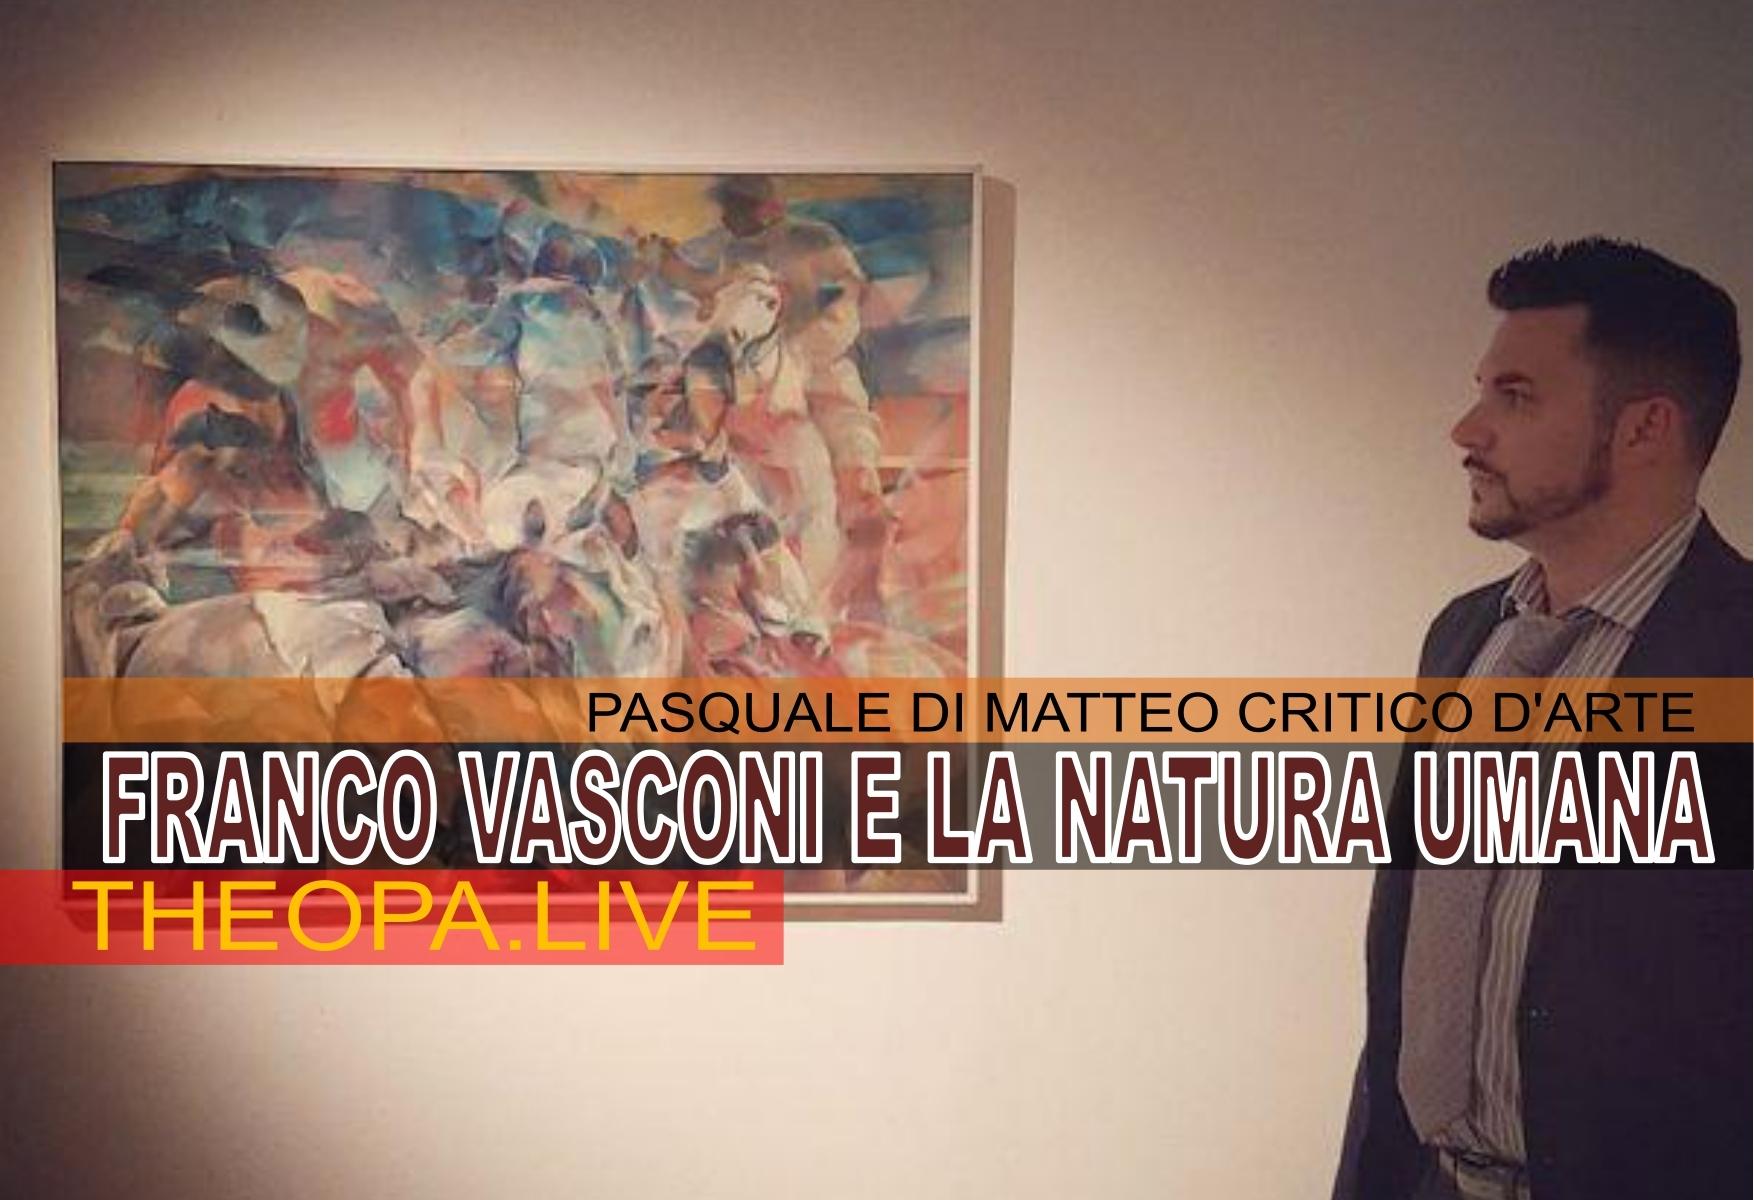 FRANCO VASCONI THEOPA